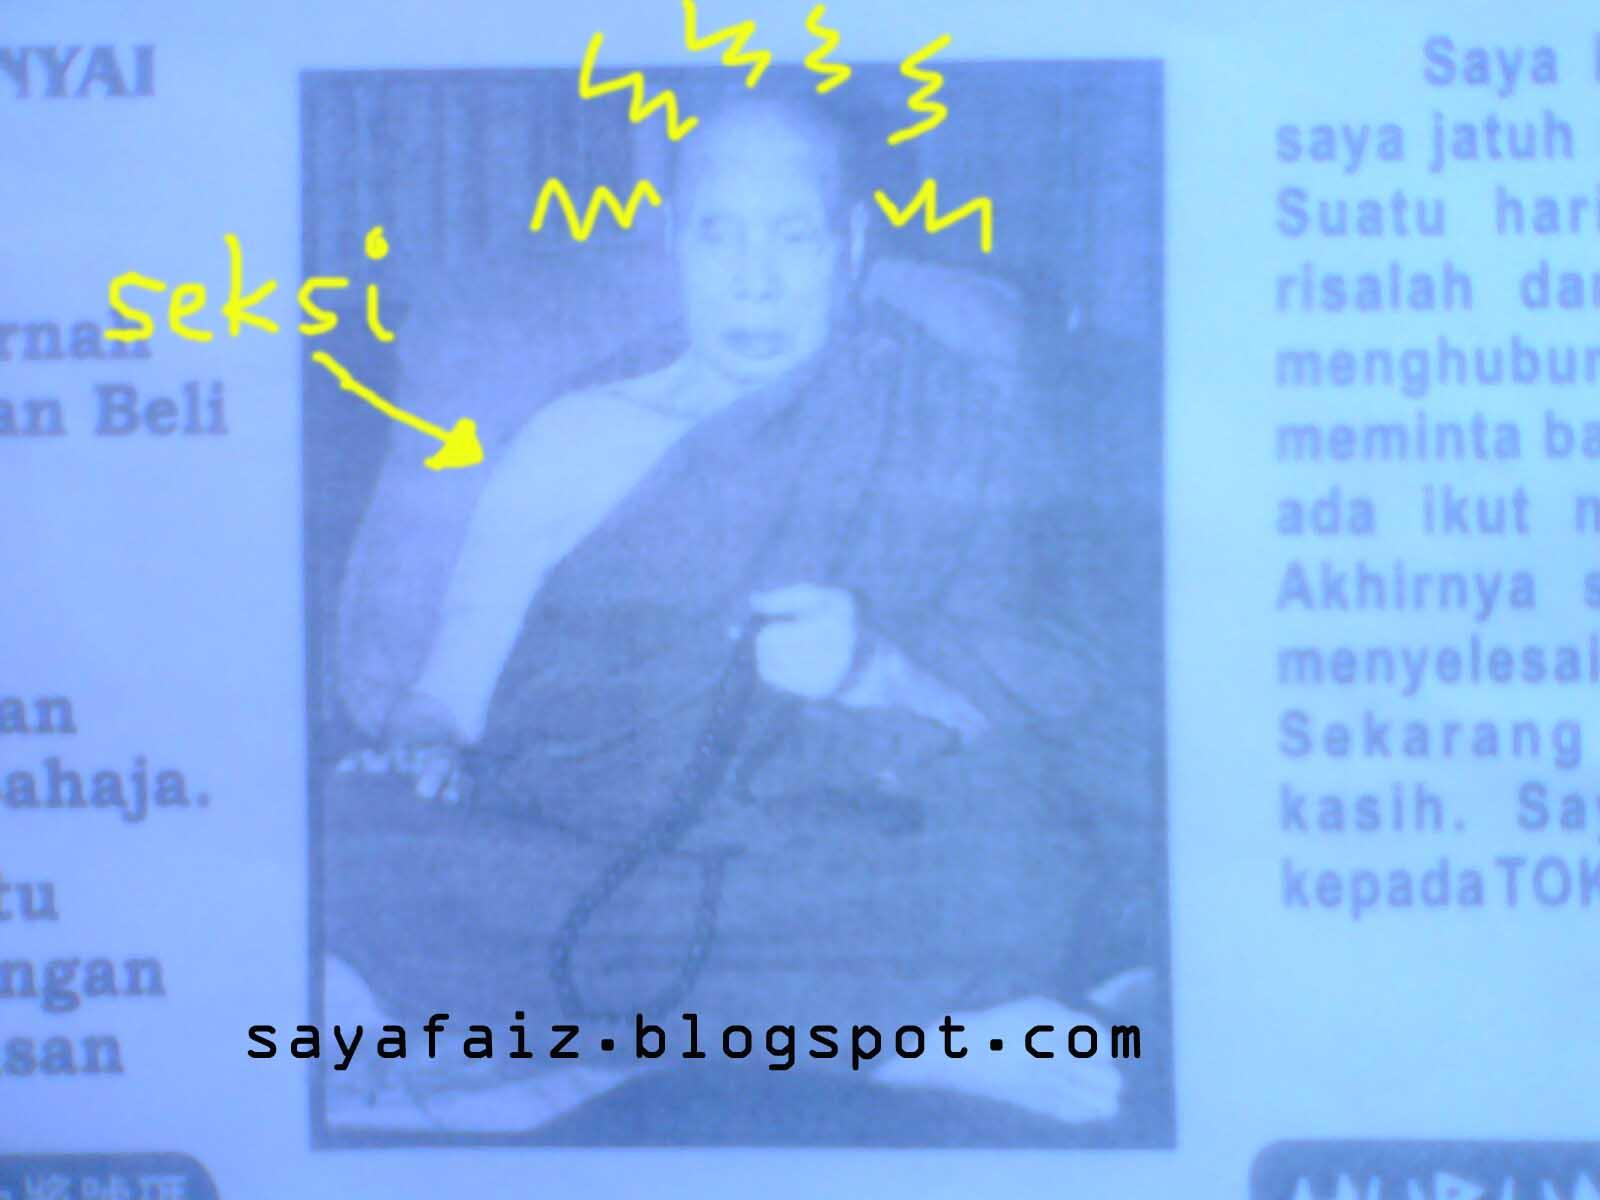 http://3.bp.blogspot.com/_zPAVP2K6WdY/TNTuI-CVlmI/AAAAAAAAA4g/Q9UQWYXTuvs/s1600/sdfsdgdfg.jpg